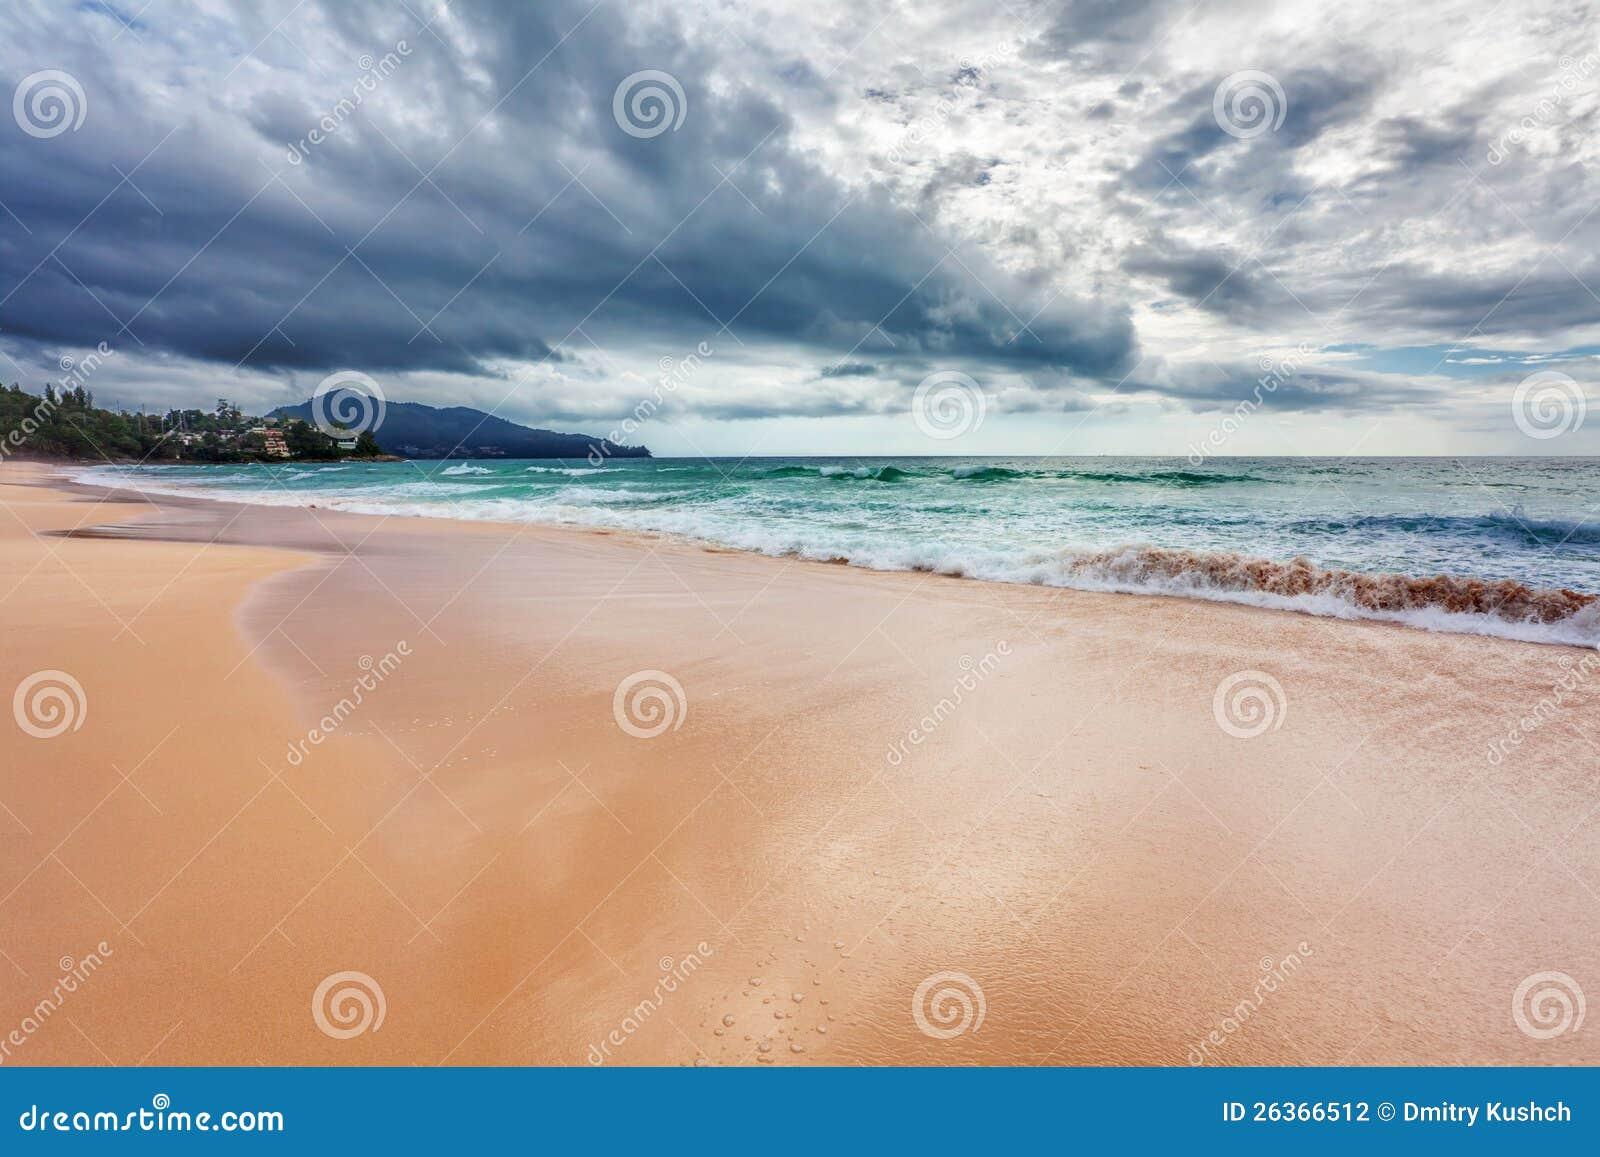 Tropischer Strand unter düsterem Himmel